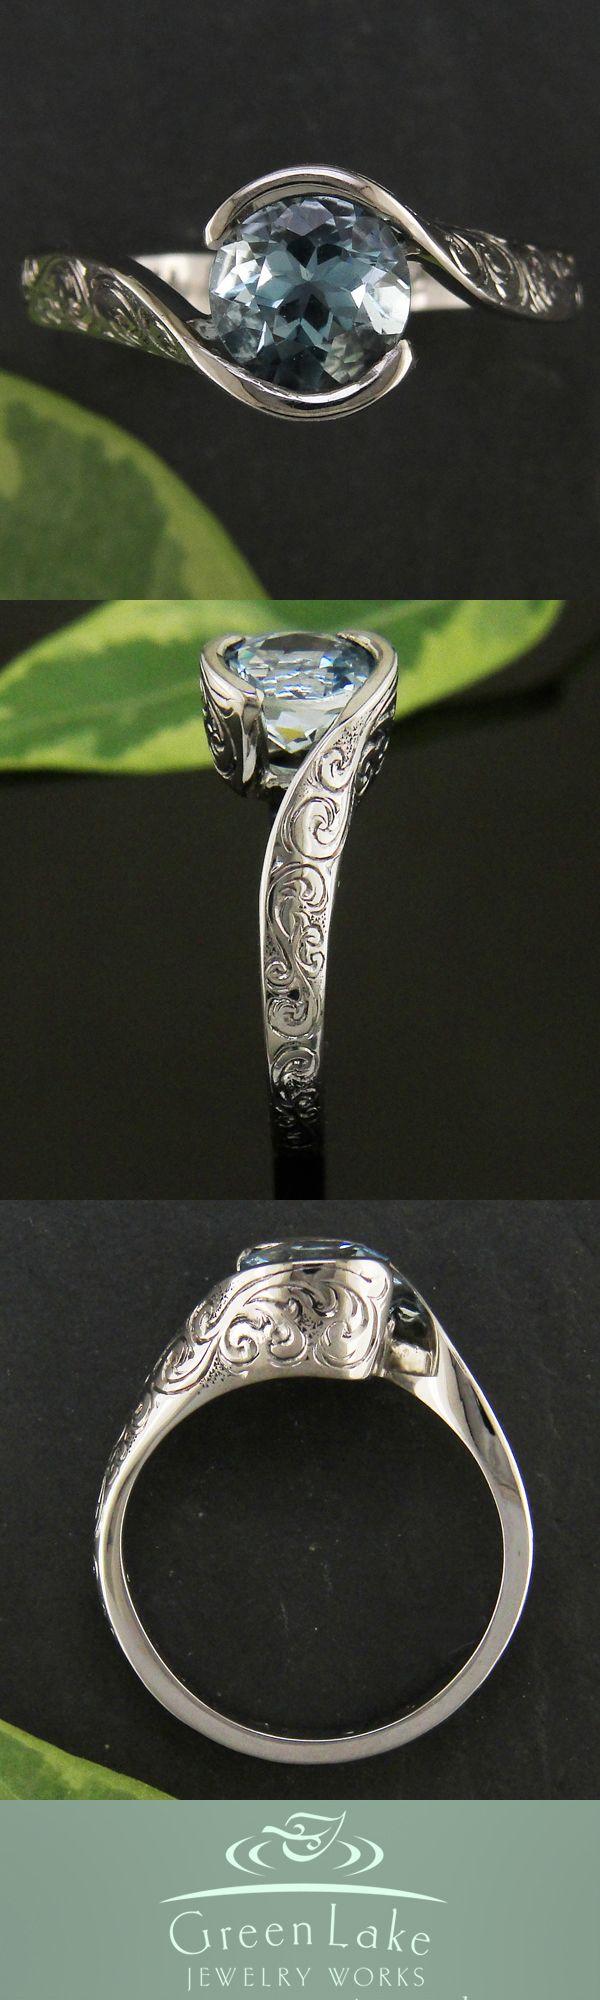 With a diamond instead. Custom palladium wrap mounting for stunning Aquamarine.